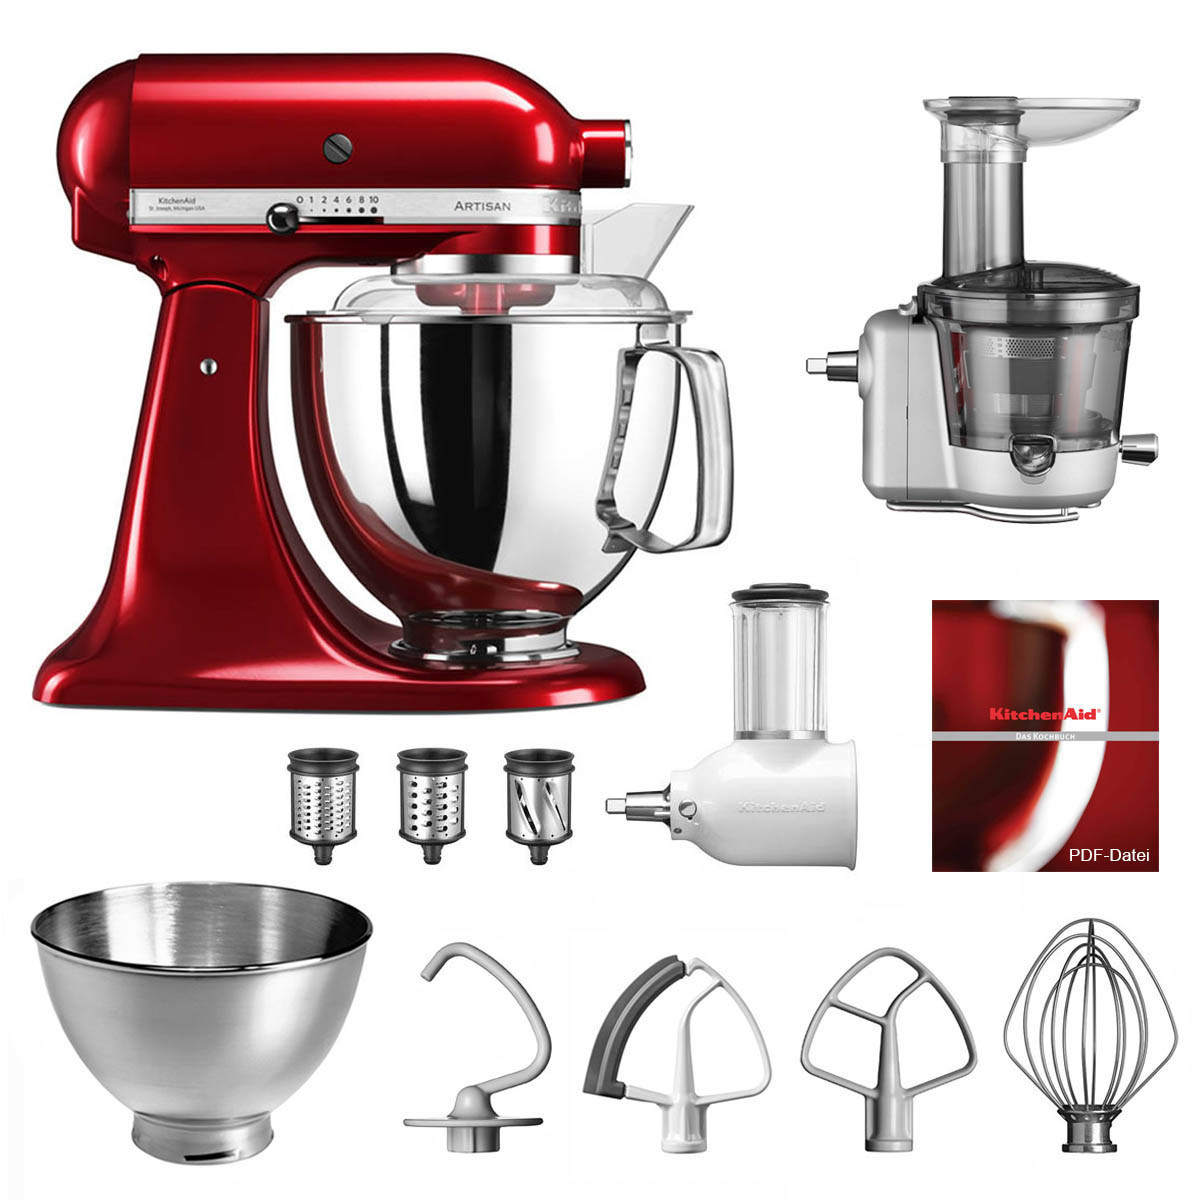 KitchenAid Artisan Küchenmaschine 5KSM175PS Entsafter Vital-Set